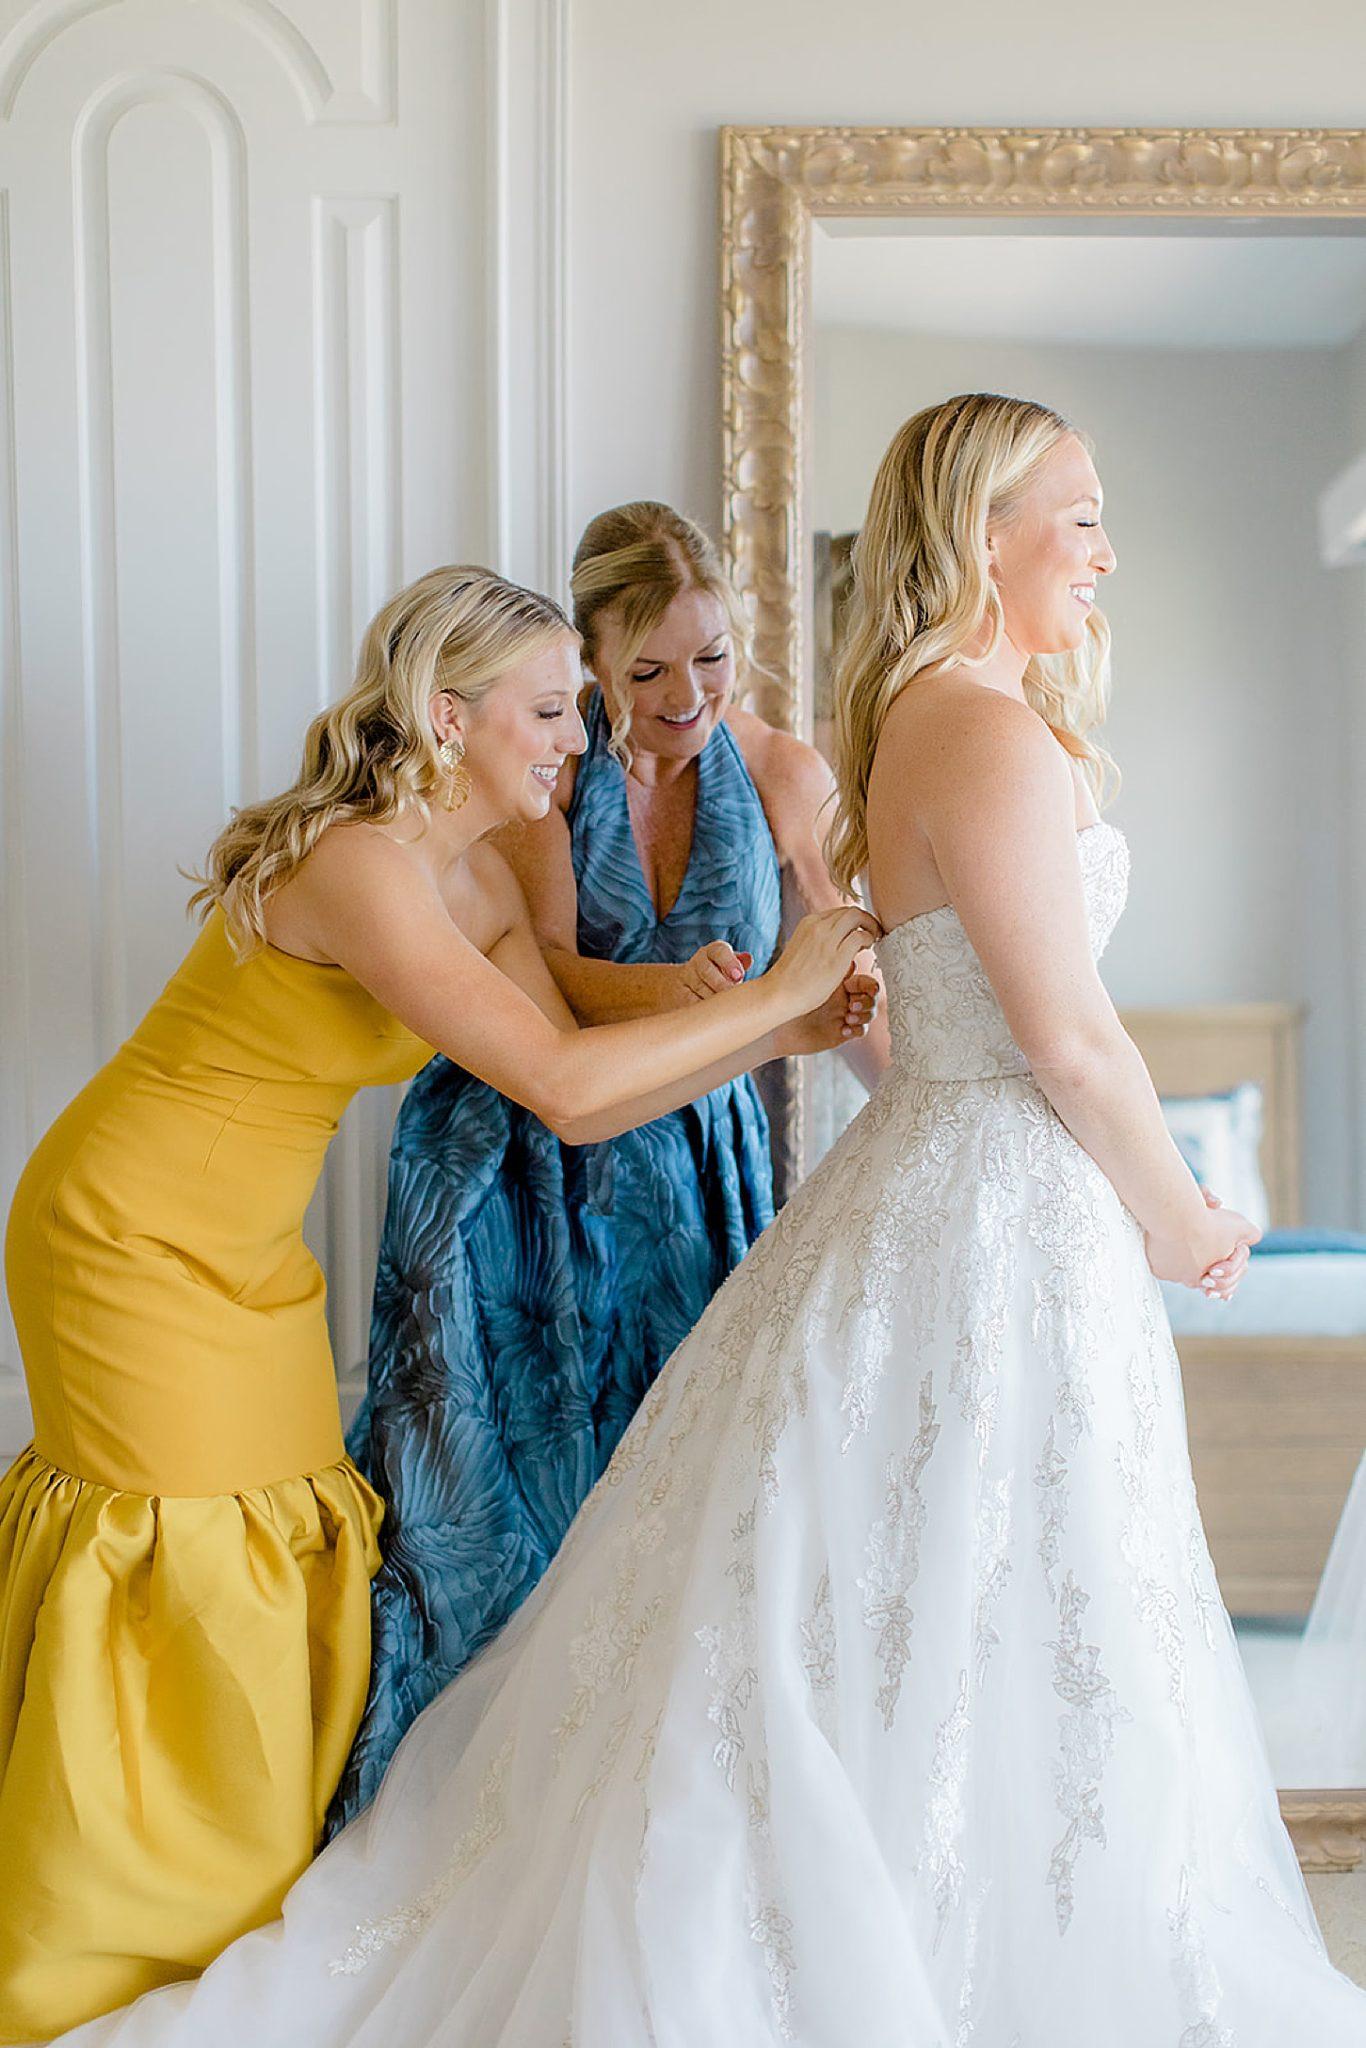 Marco Island Florida Wedding Photography by Magdalena Studios 0008 scaled